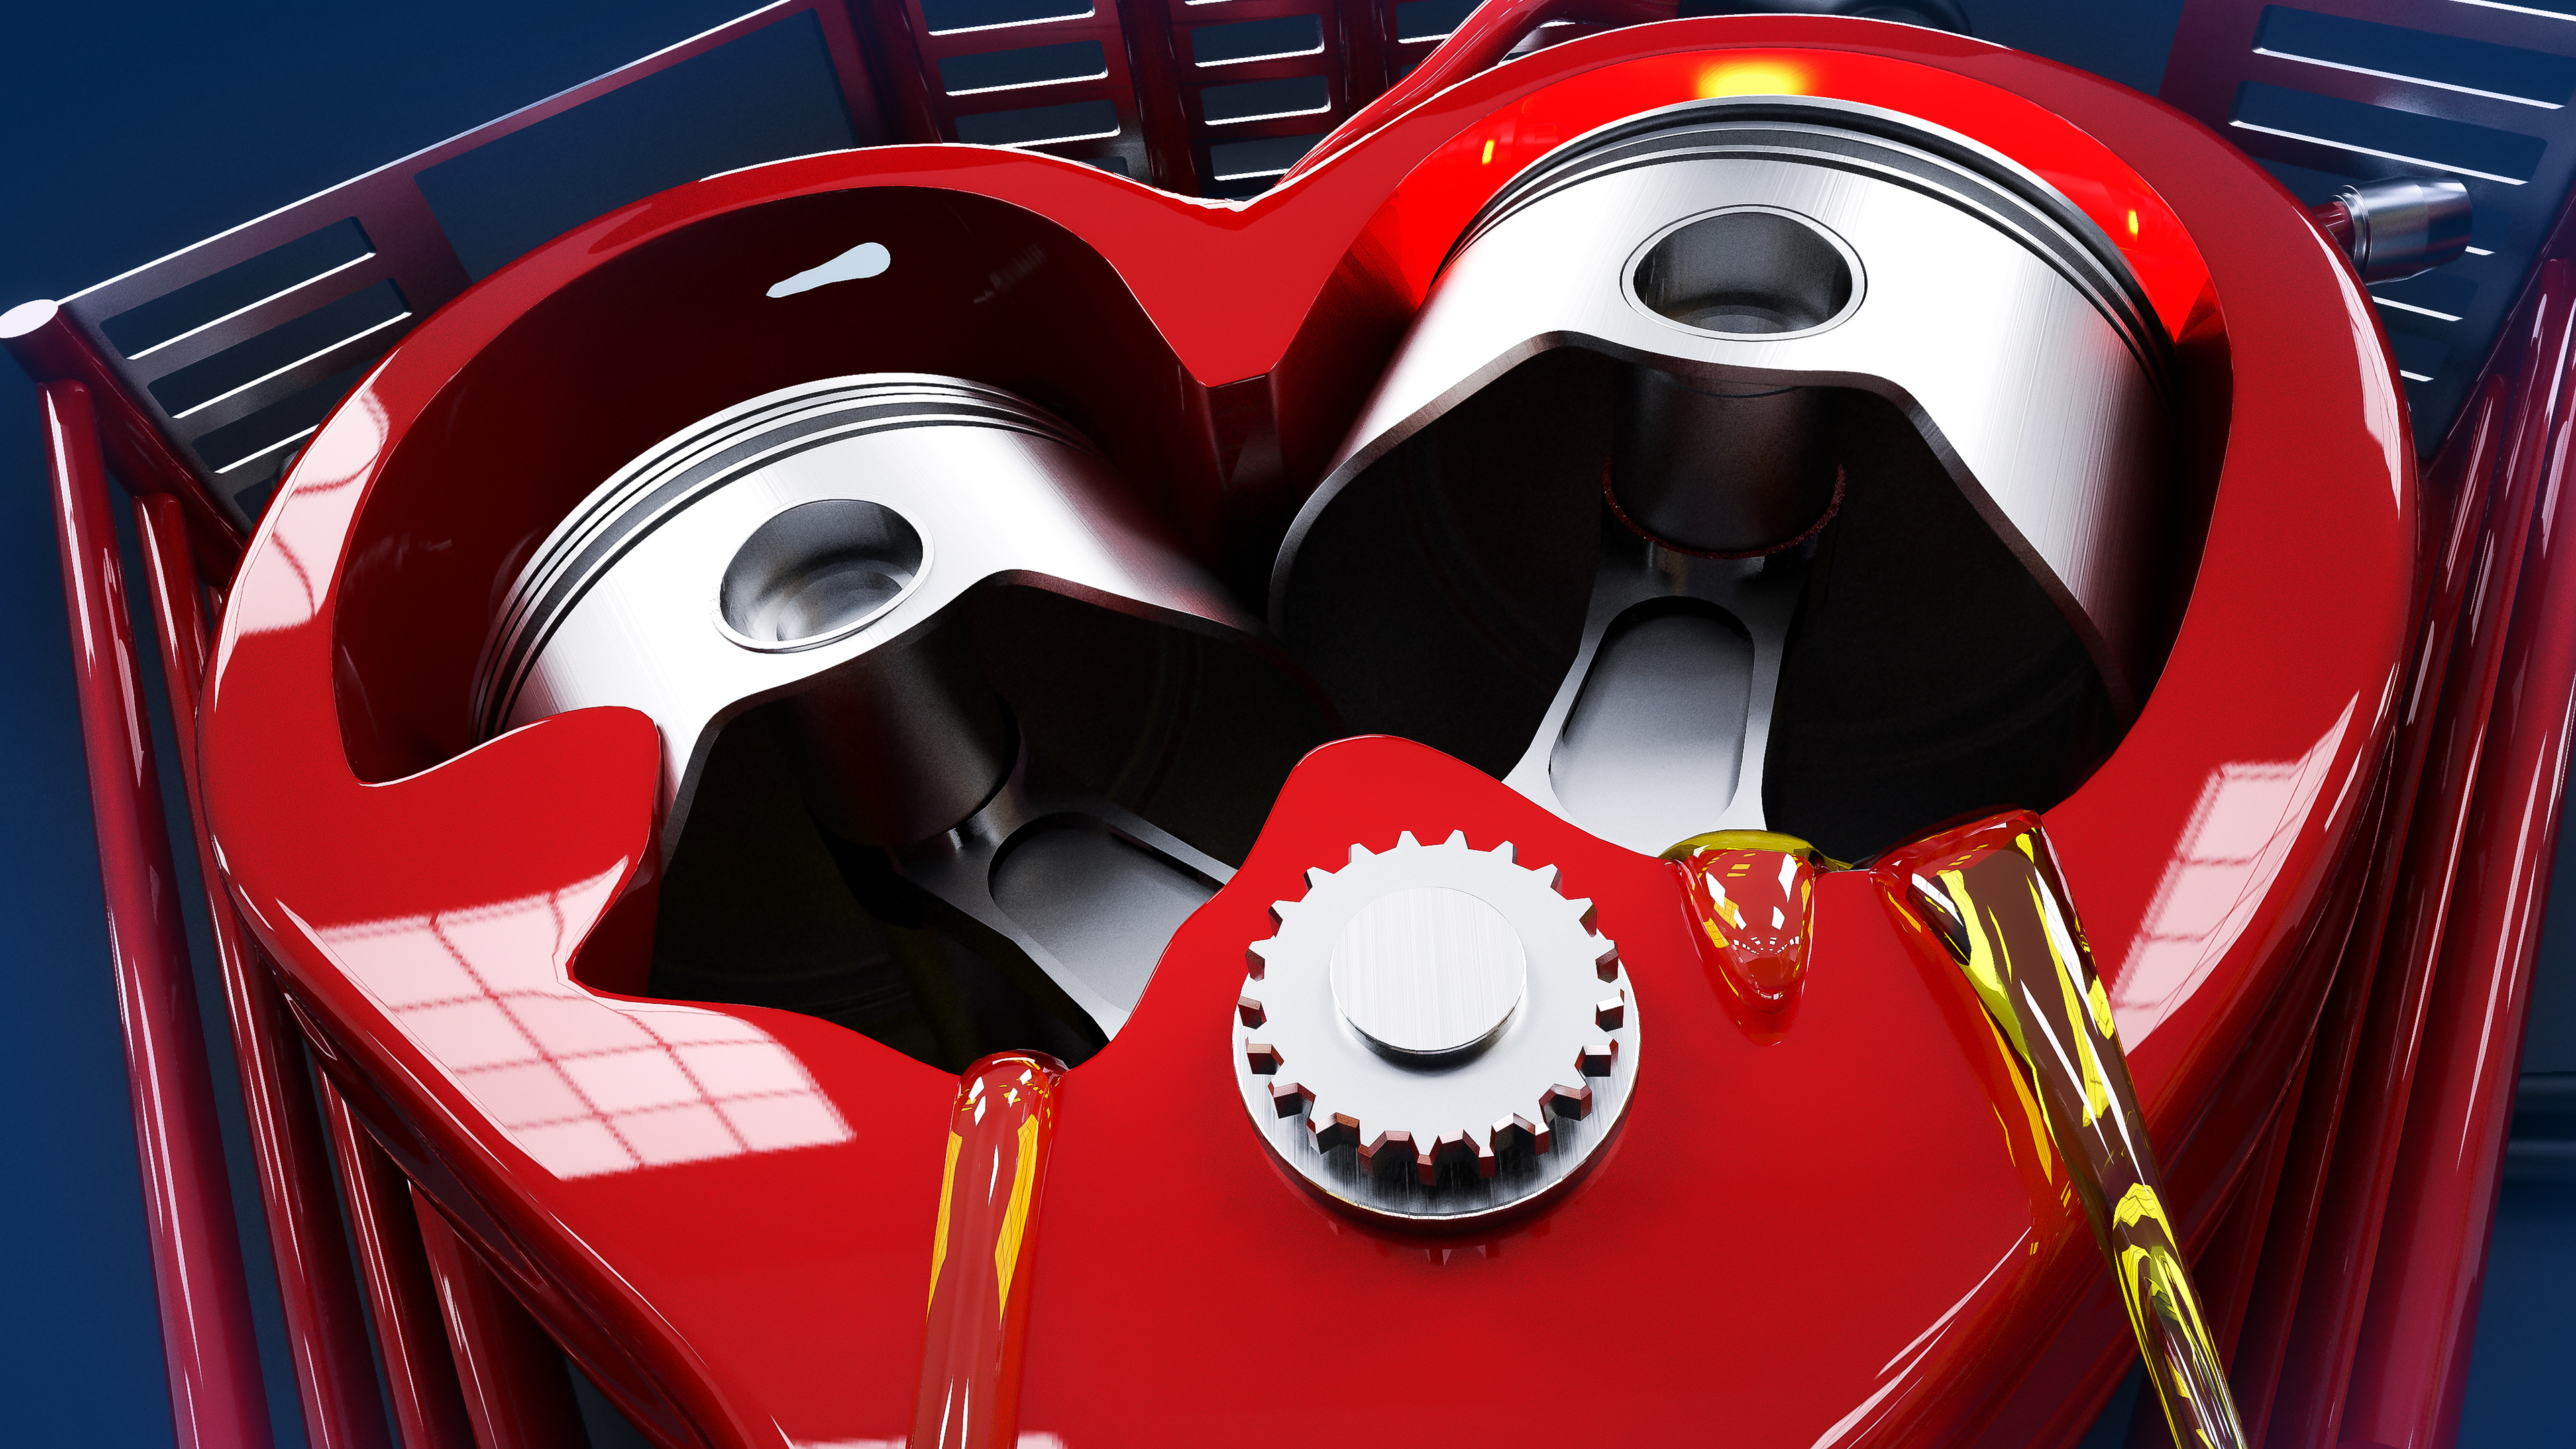 картинки в виде сердца-мотора всё